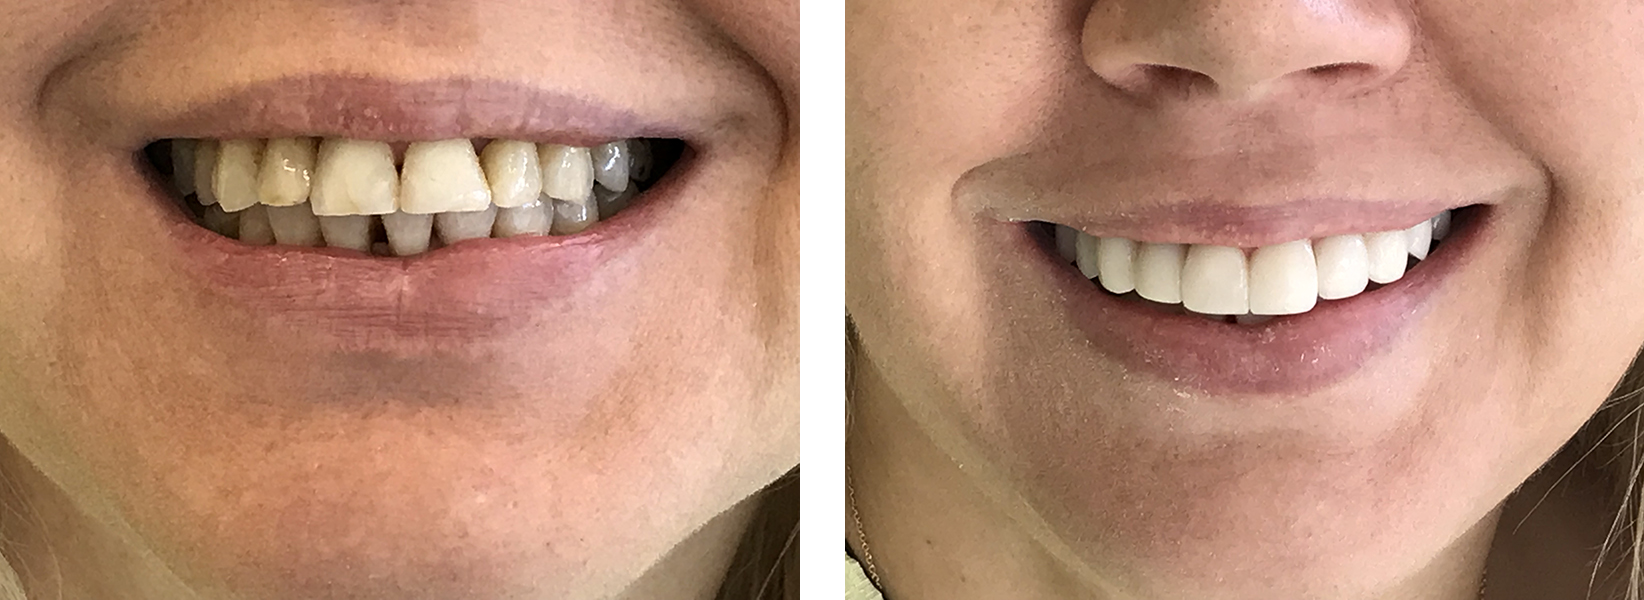 bonding δοντιών 4η εικόνα